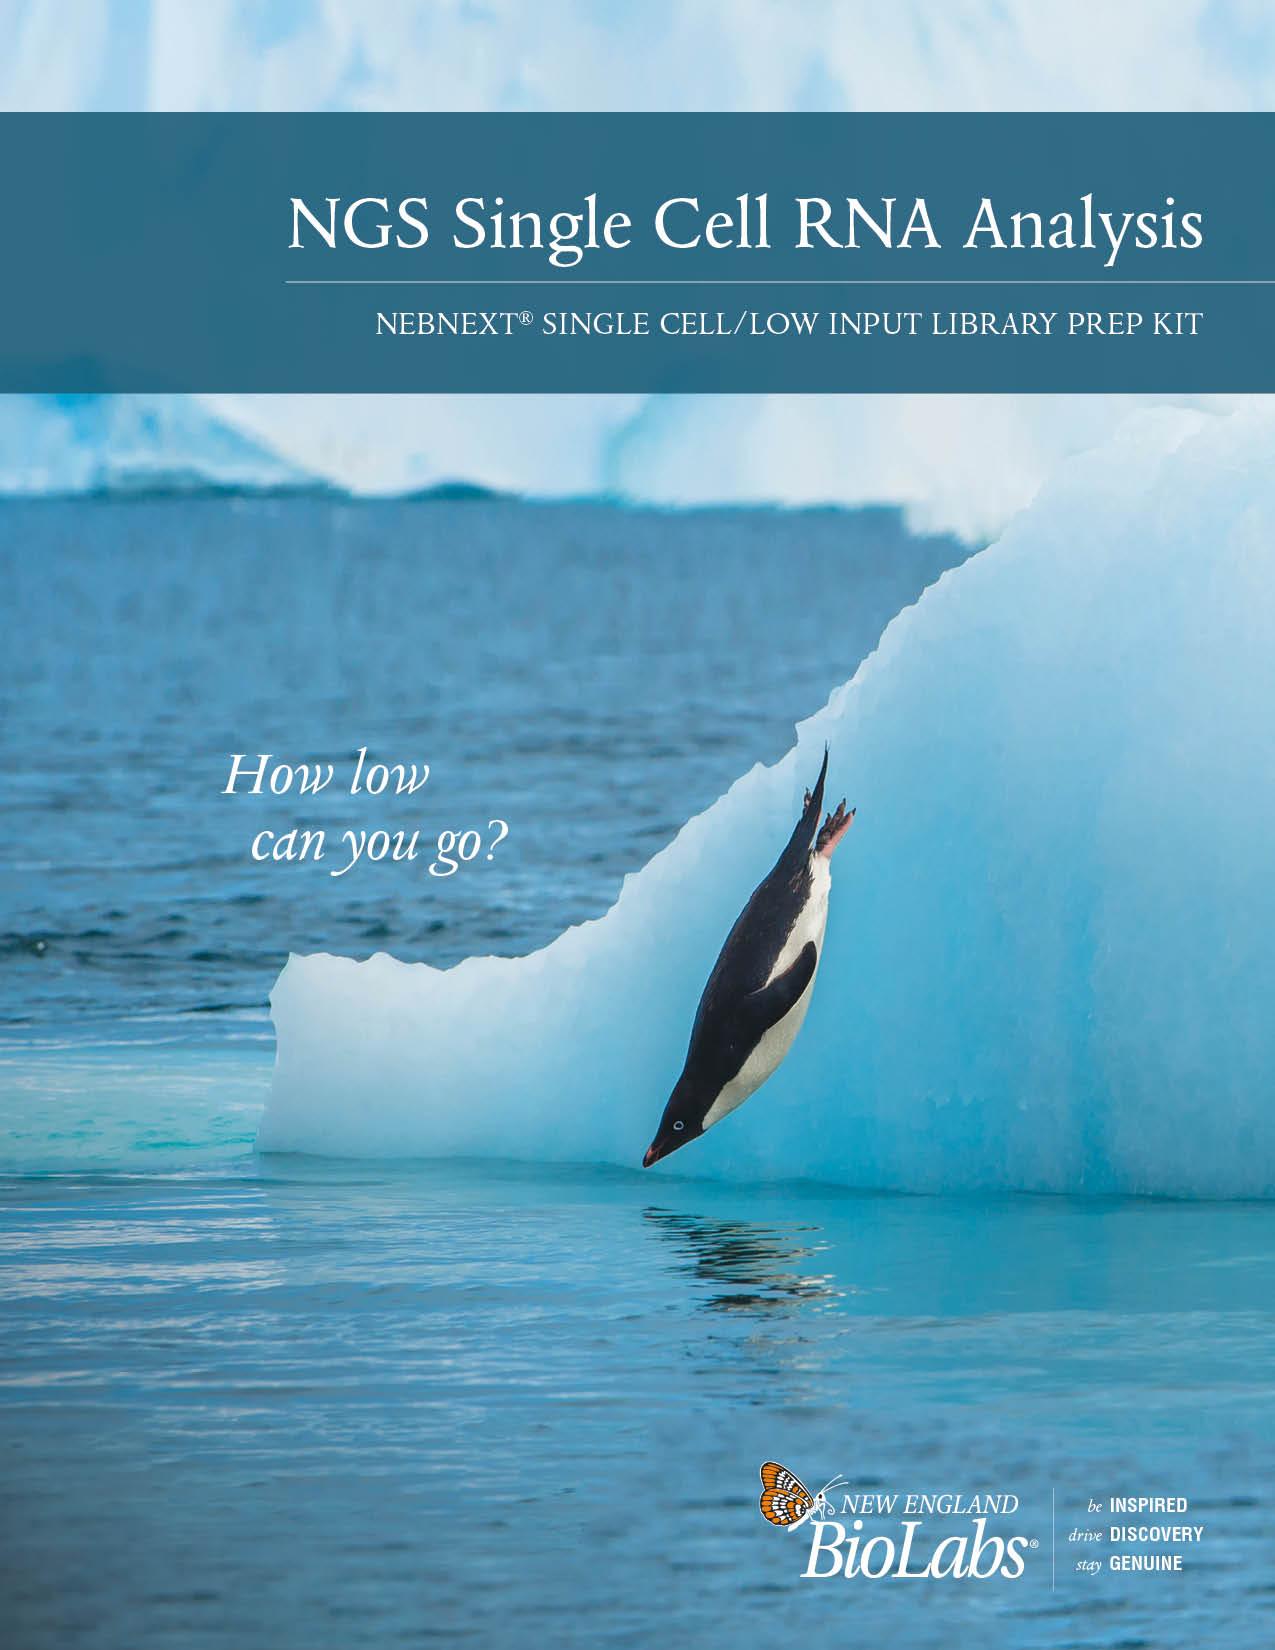 NEBNext Single Cell Analysis